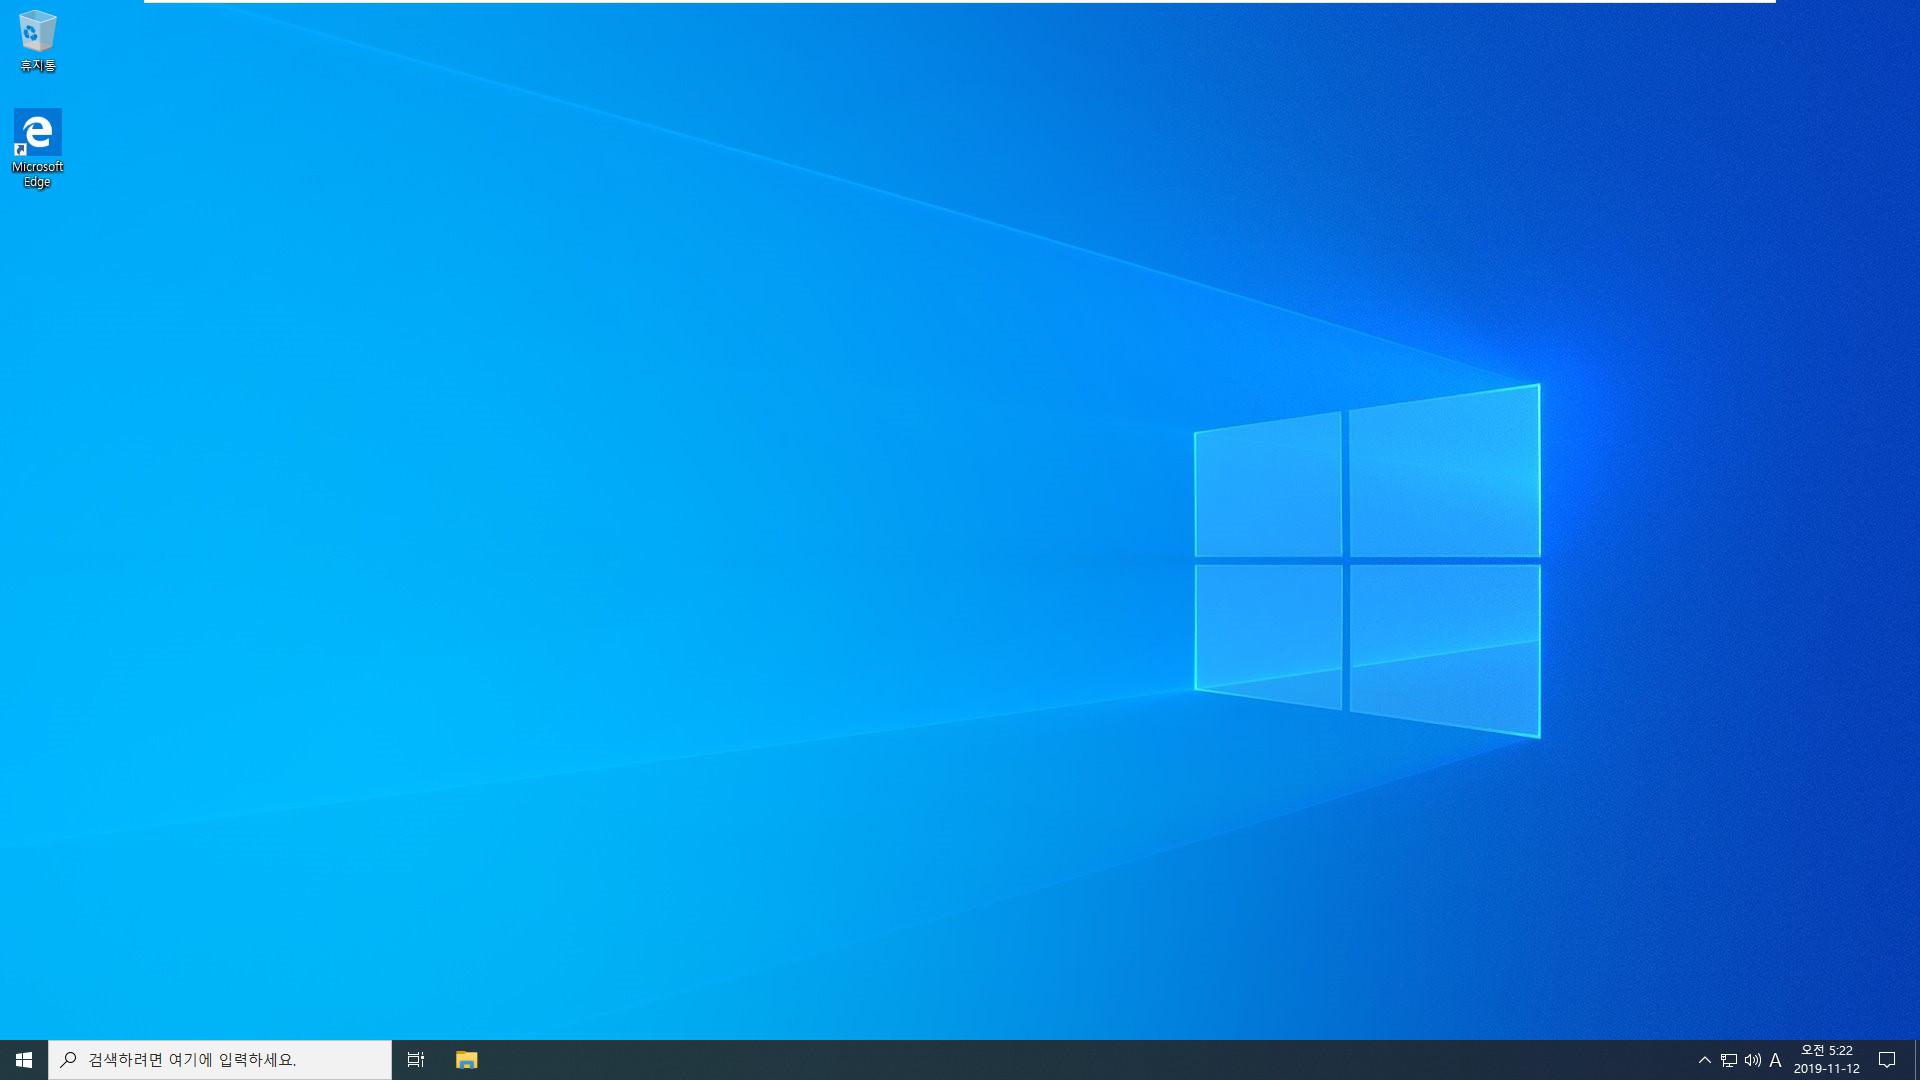 Windows 10 Enterprise LTSC [2019] (버전 1809) 를 버전 1903 프로로 업그레이드 설치하기 - 우선 설정과 앱 유지를 위해서 버전 1903 Enterprise로 업그레이드 한 후에 버전 1903 Pro로 변경하면 됩니다 2019-11-12_052217.jpg